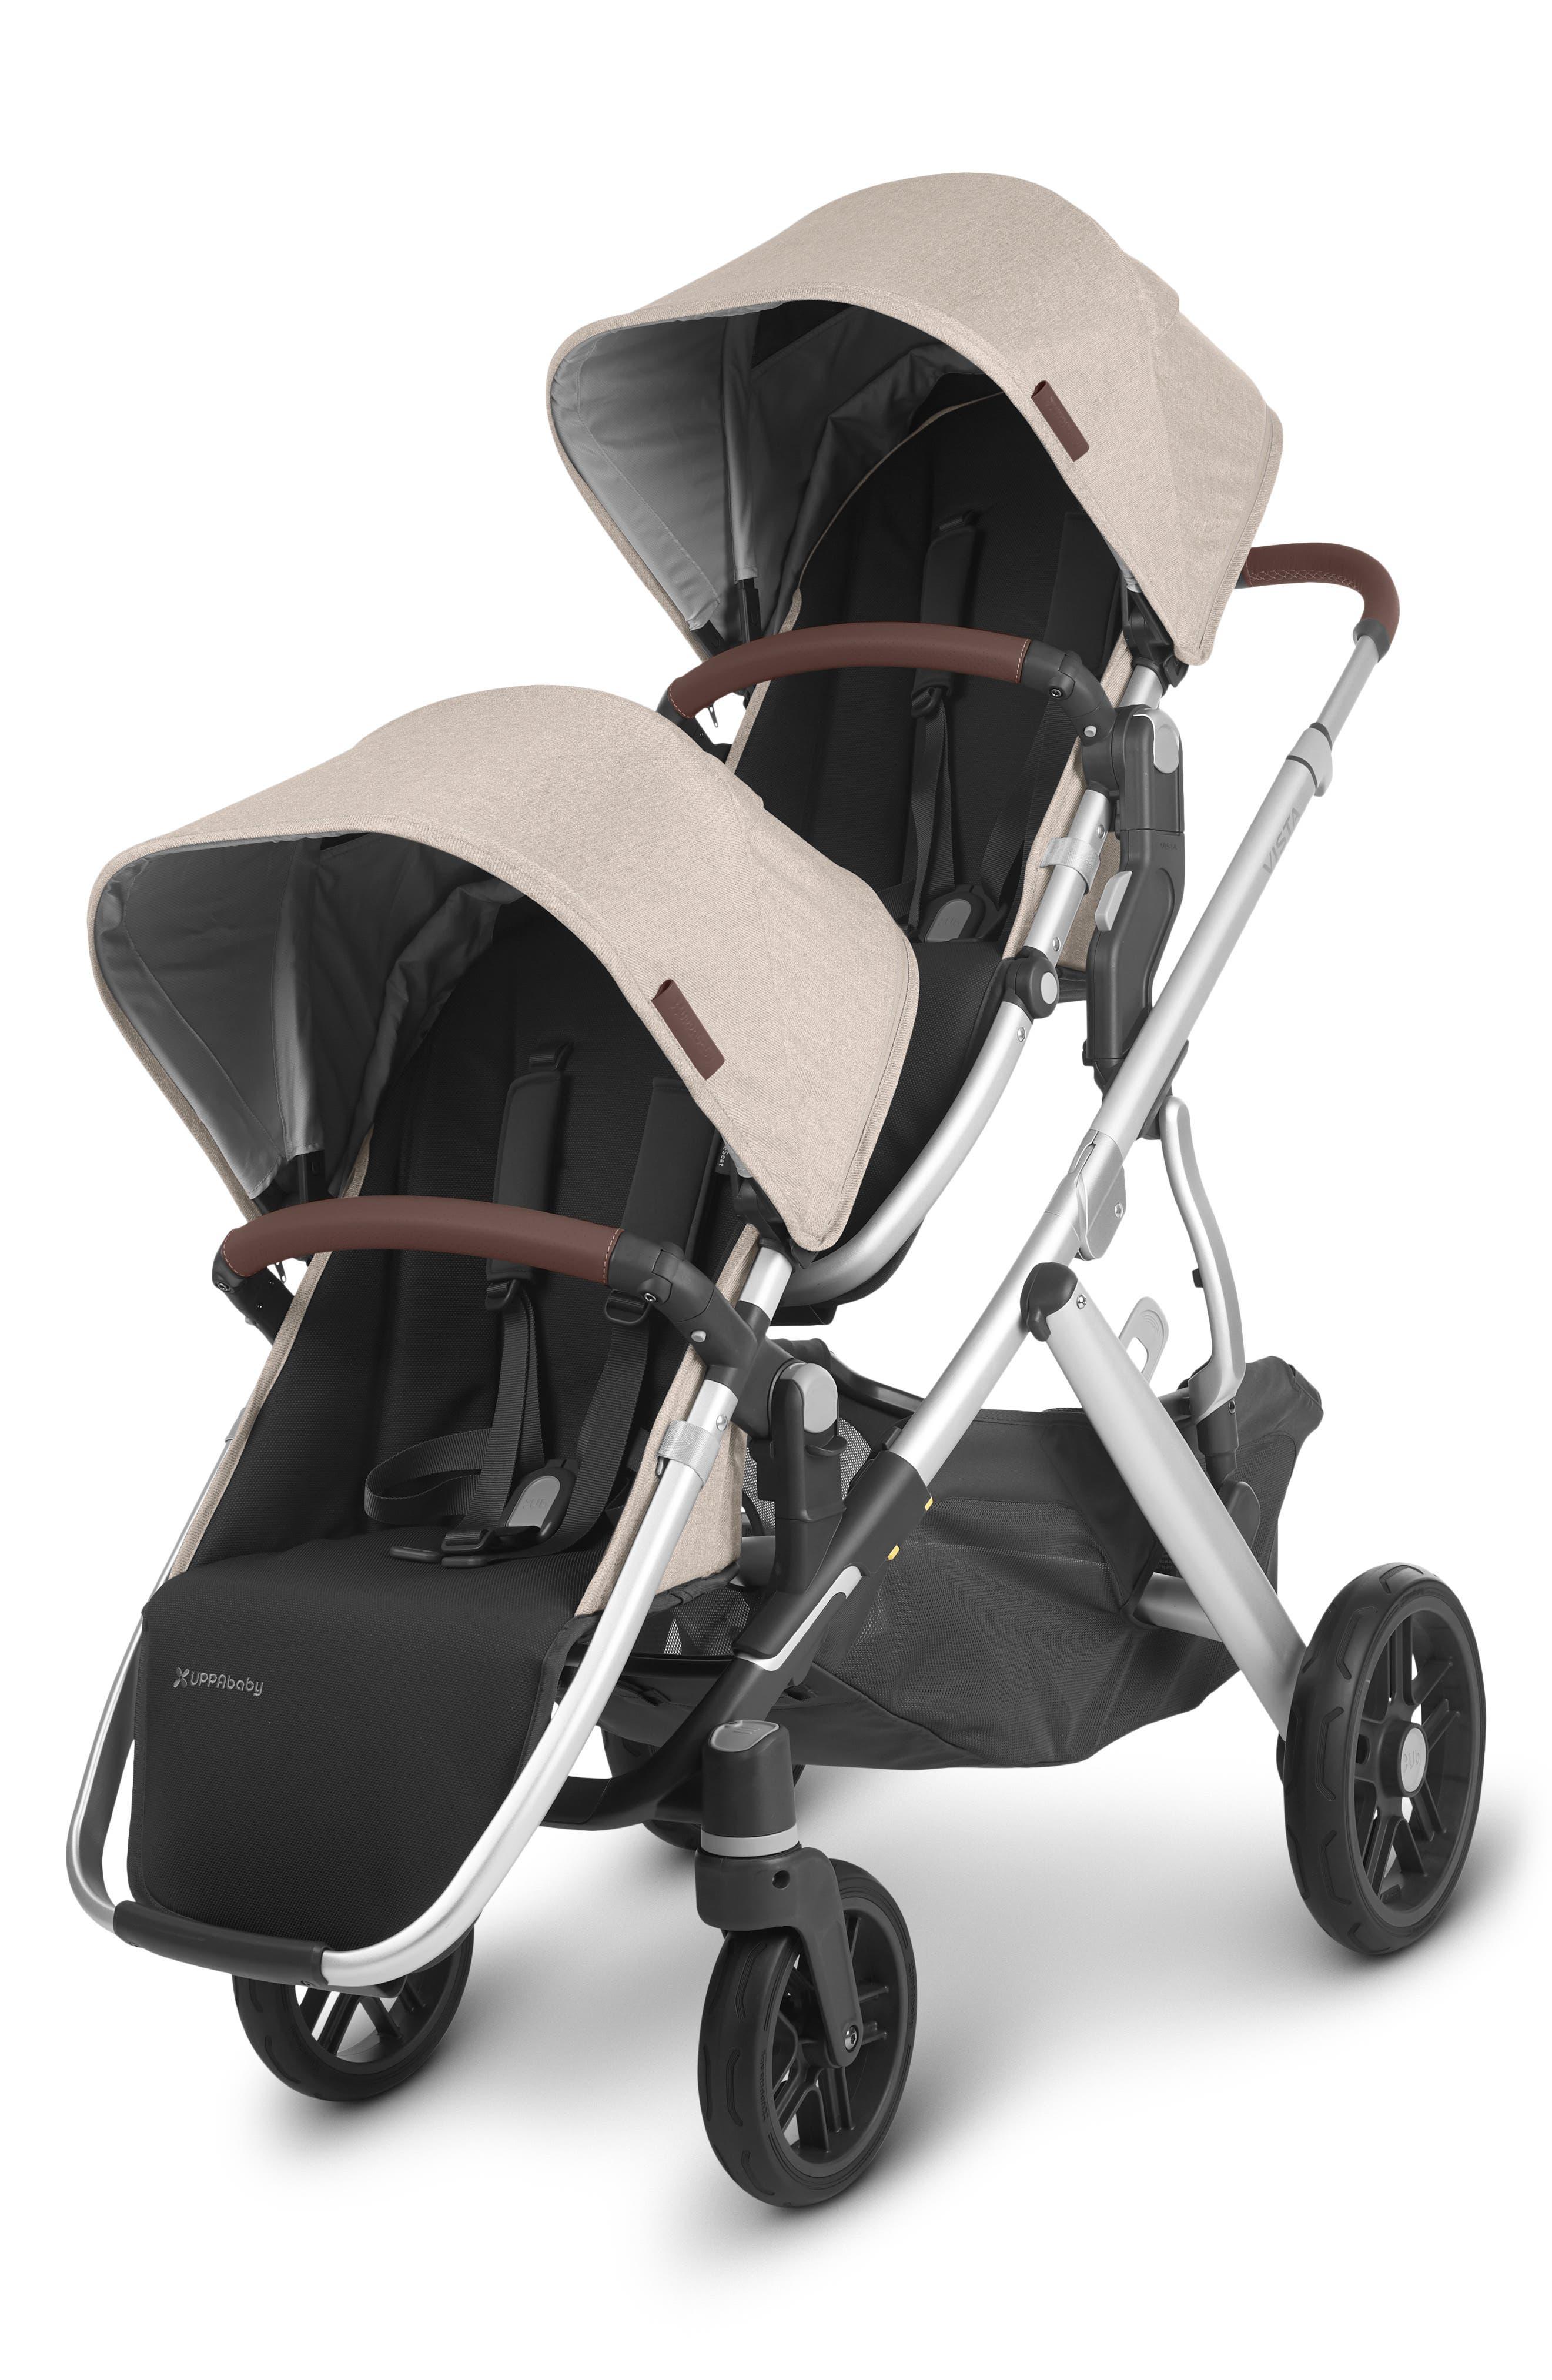 UPPAbaby Infant Uppababy Vista V2 Stroller With Bassinet, Size One Size - Beige